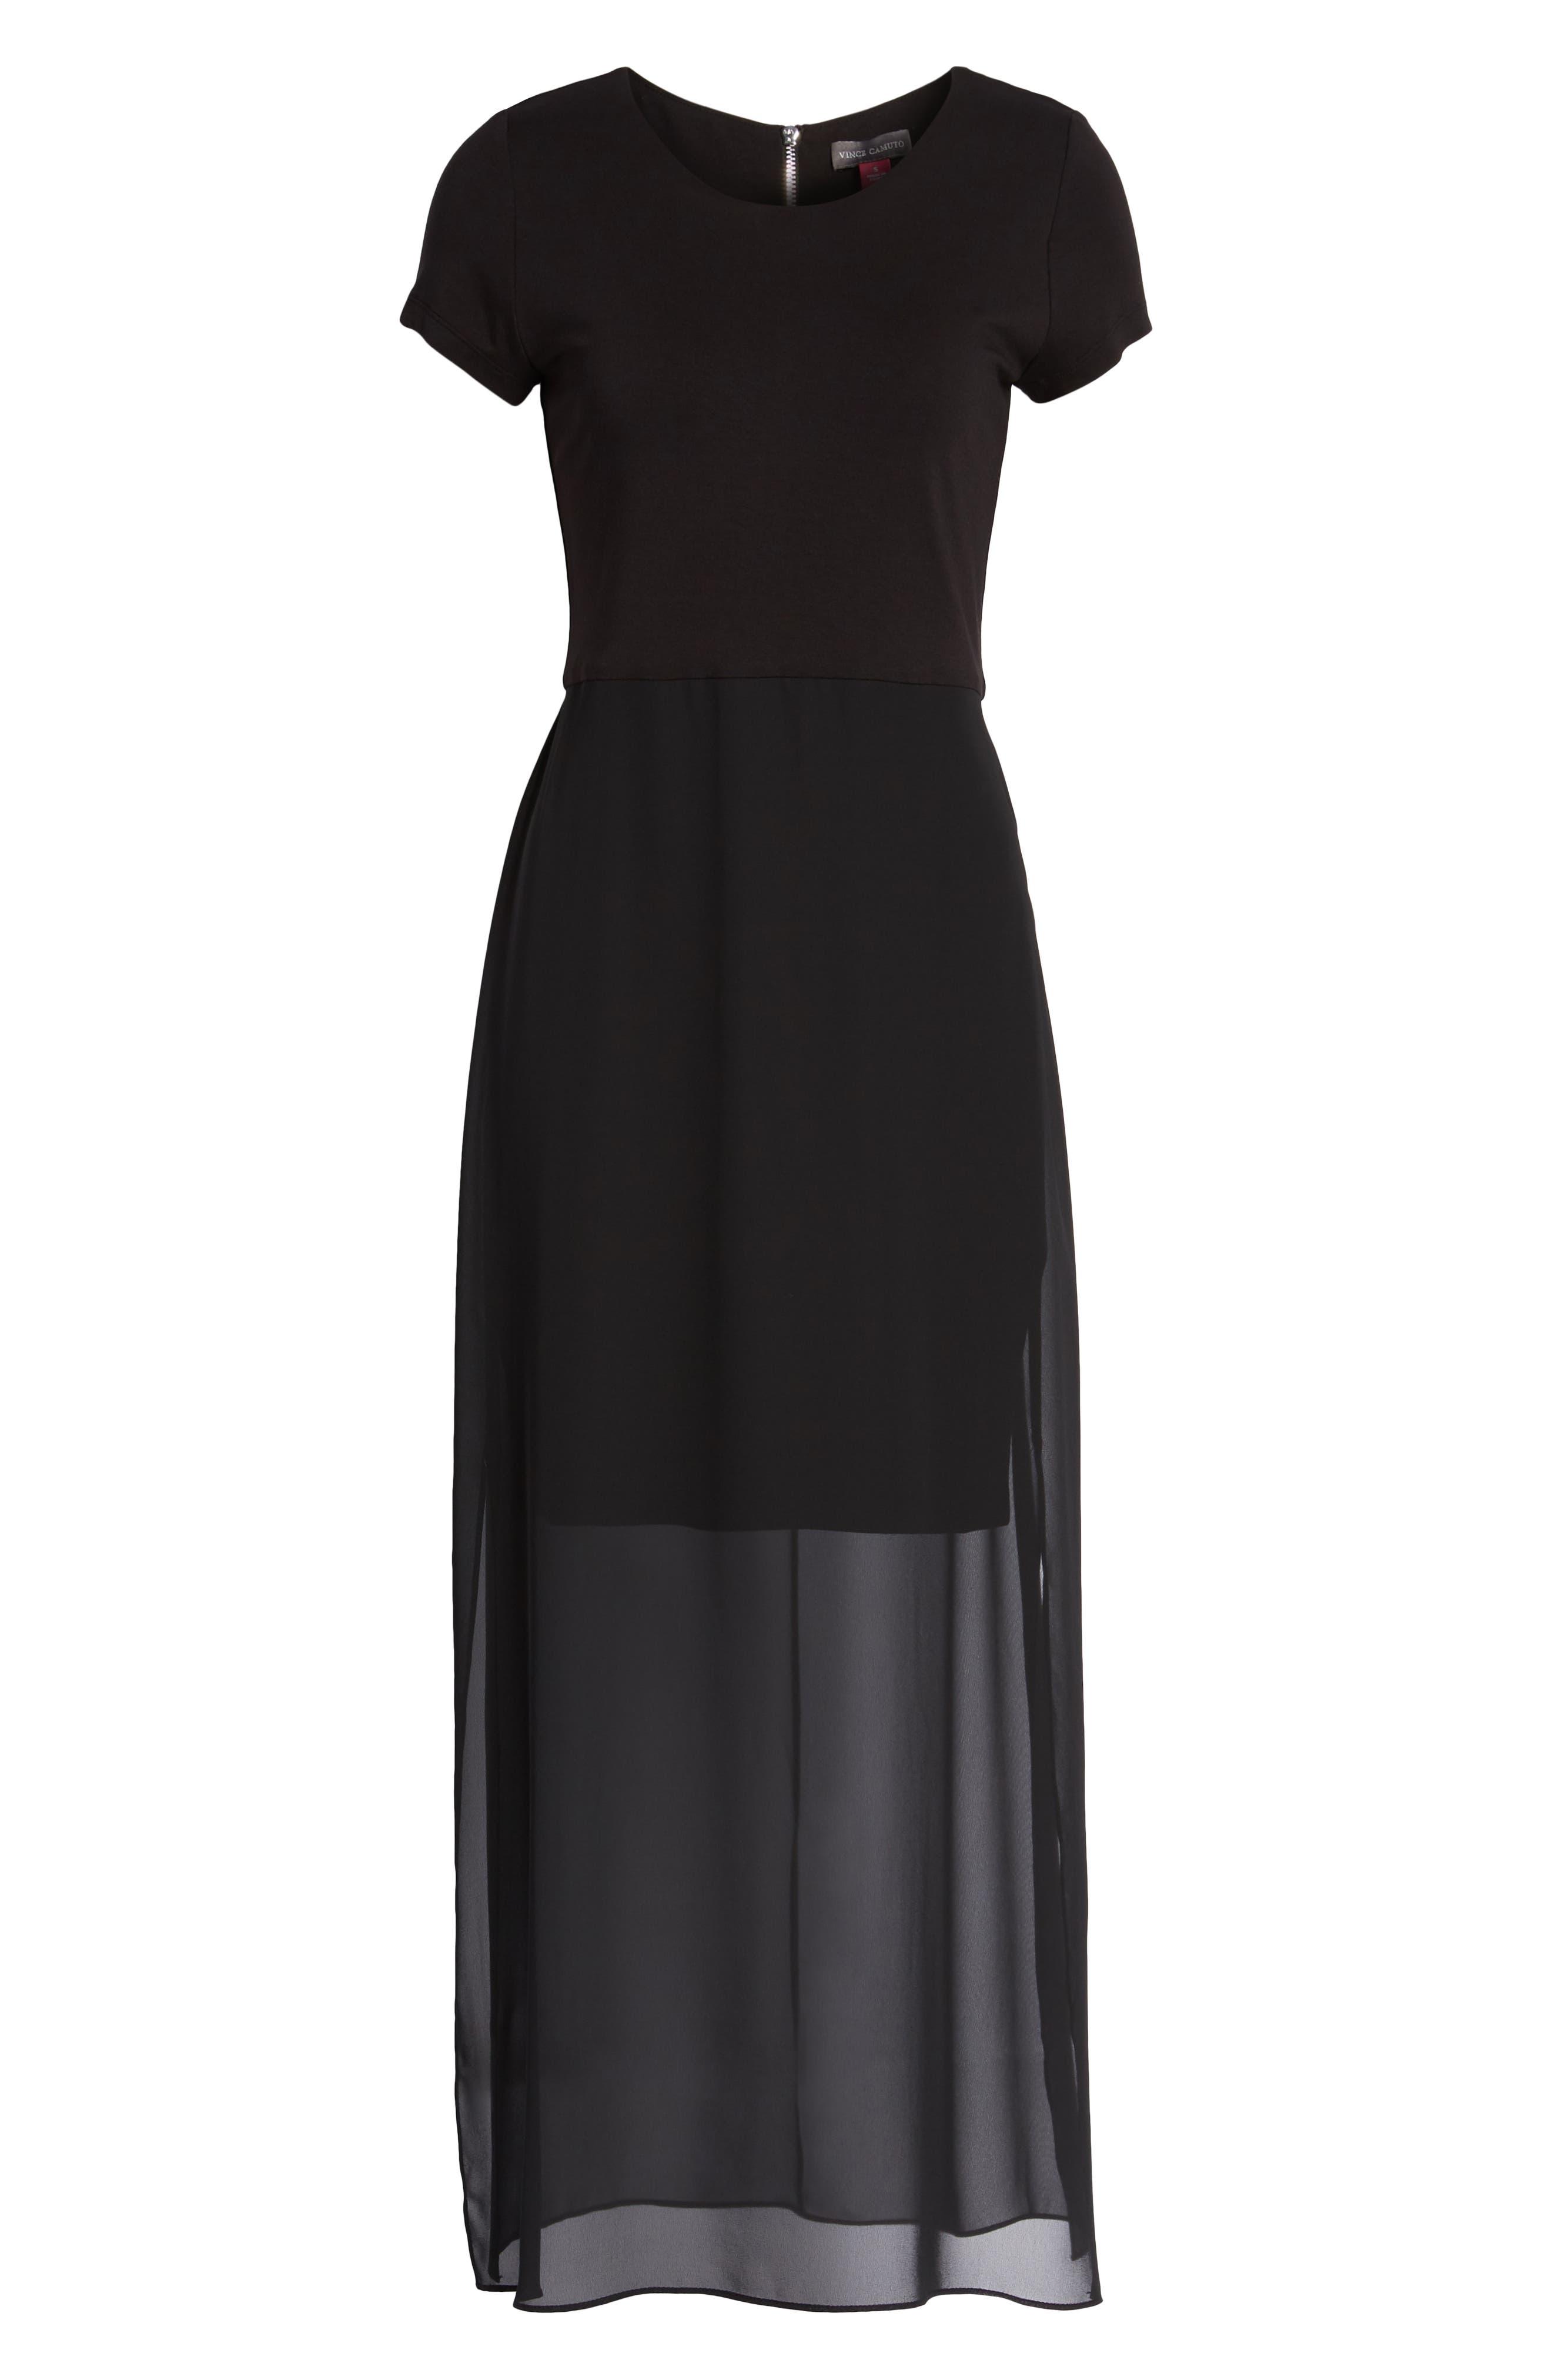 Chiffon Overlay Maxi Dress,                             Alternate thumbnail 7, color,                             RICH BLACK